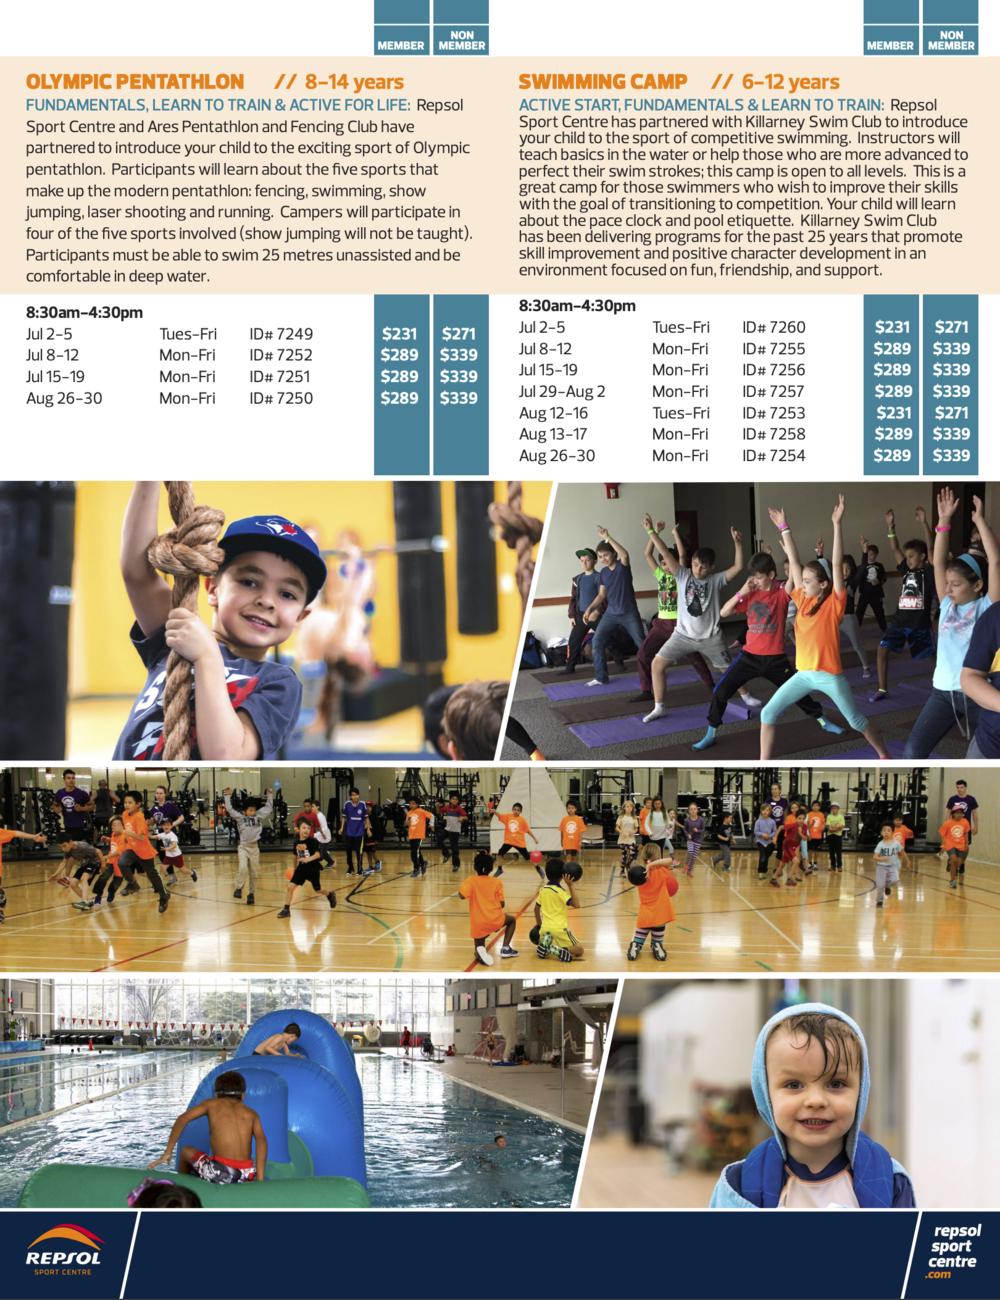 Olympic Pentathlon Summer Camps